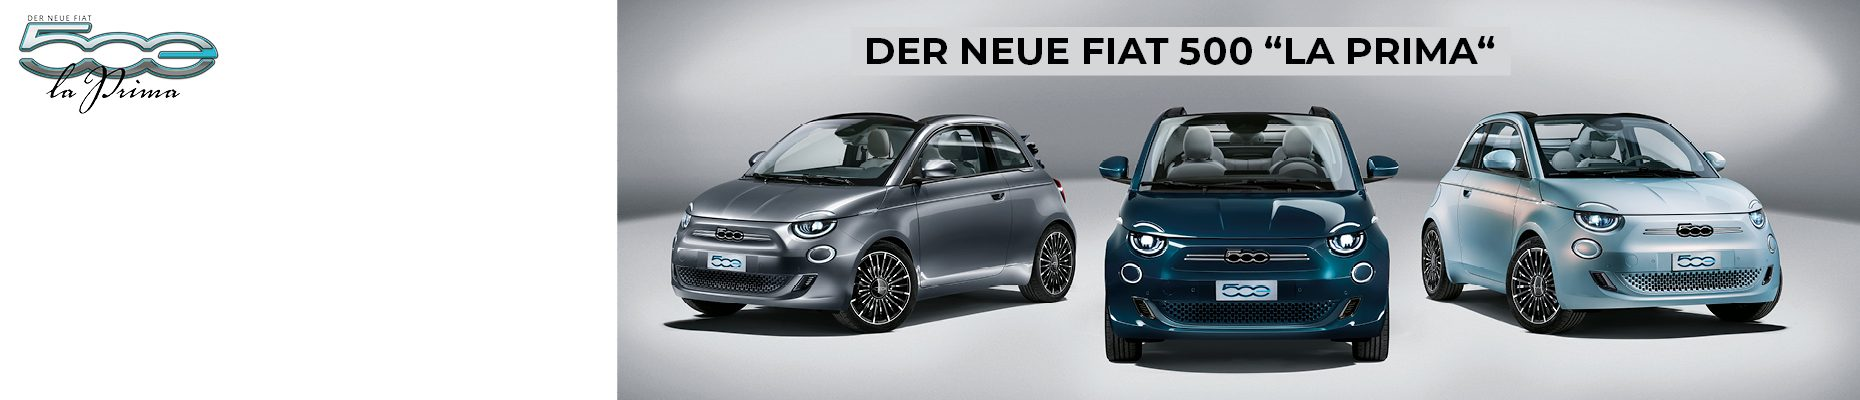 1864x400_Fiat_laprima_elektrisch